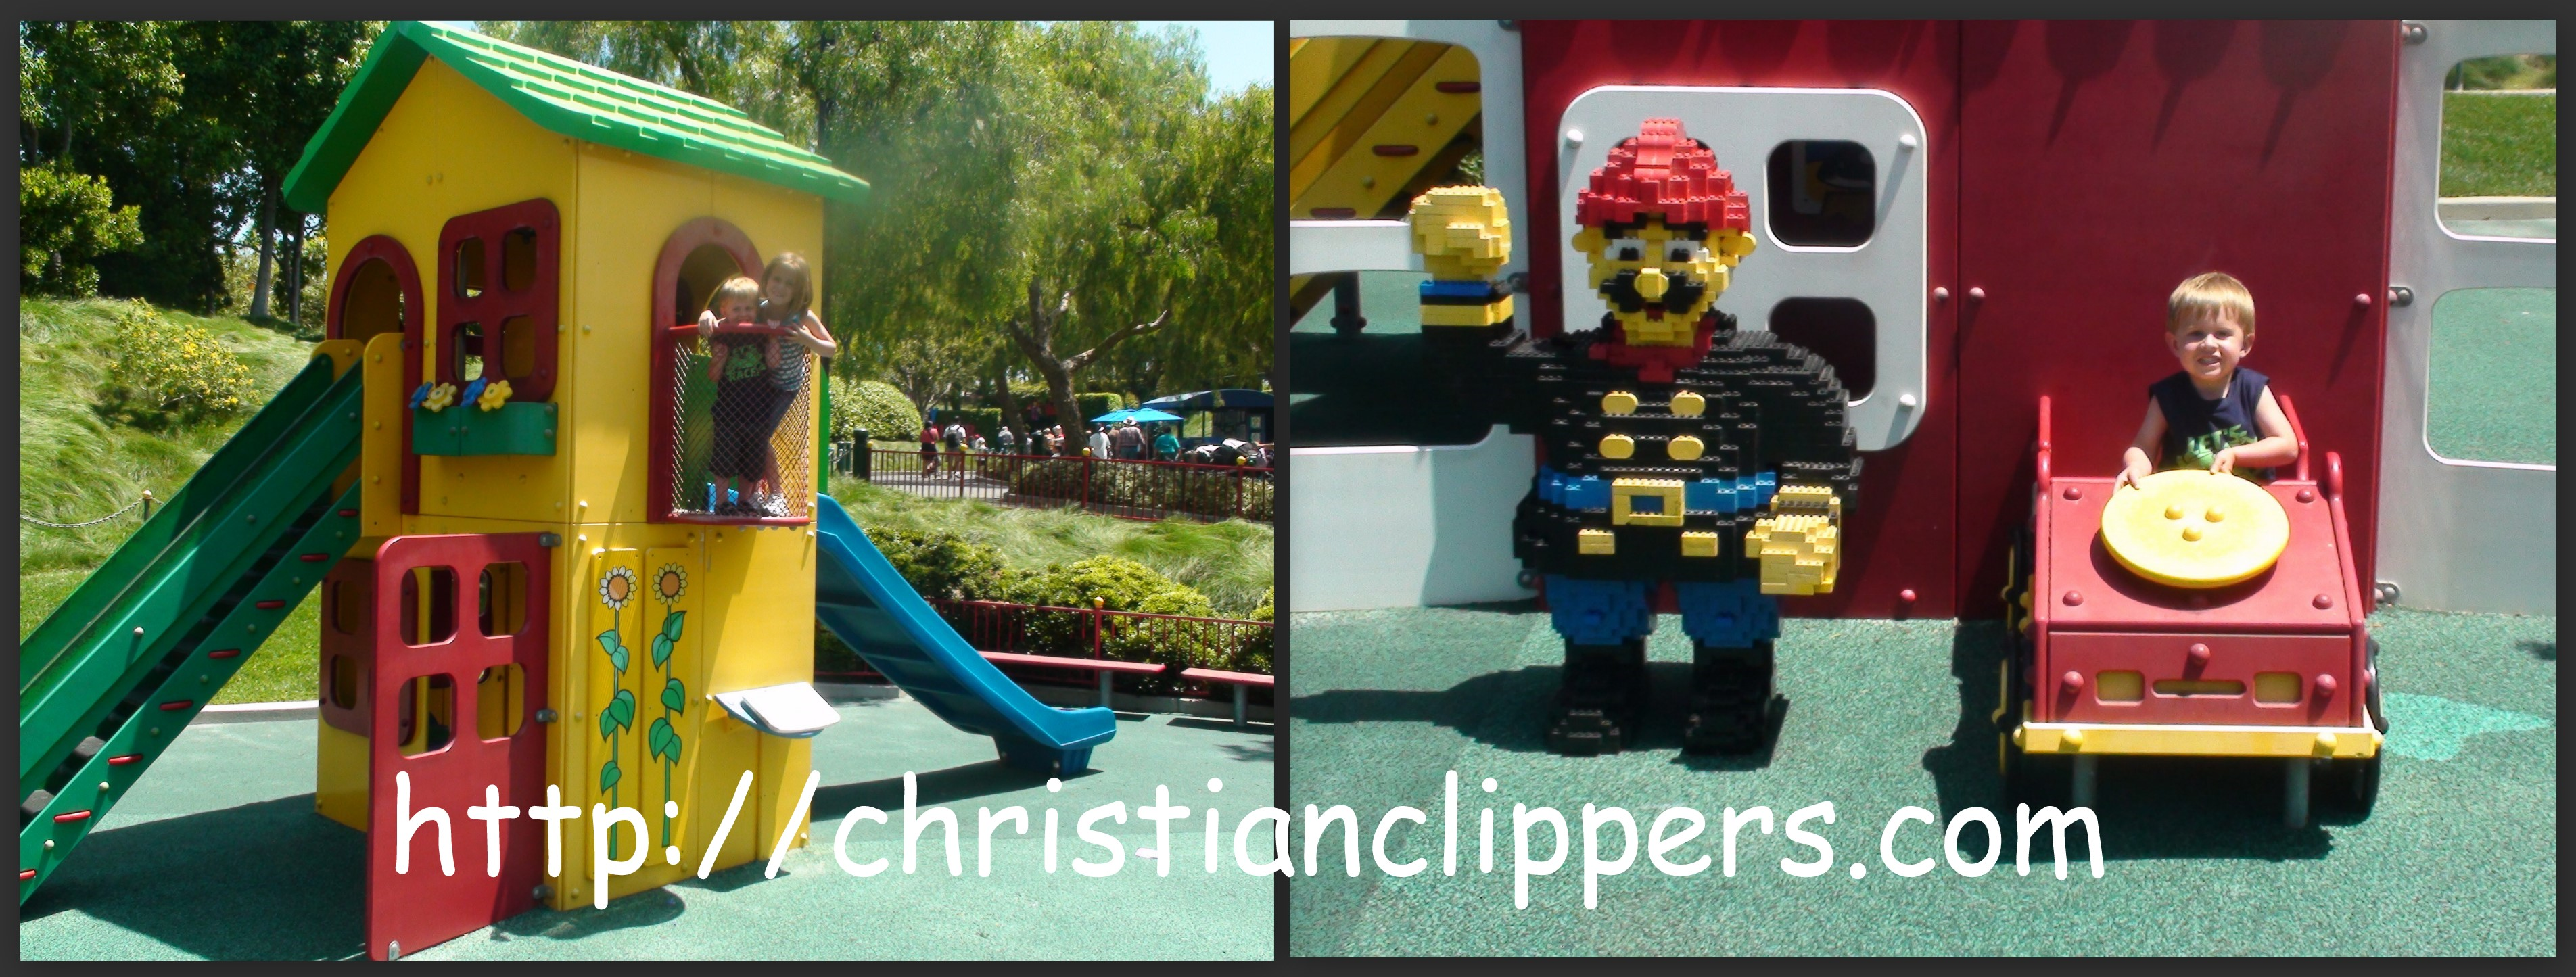 Legoland Duplo Village